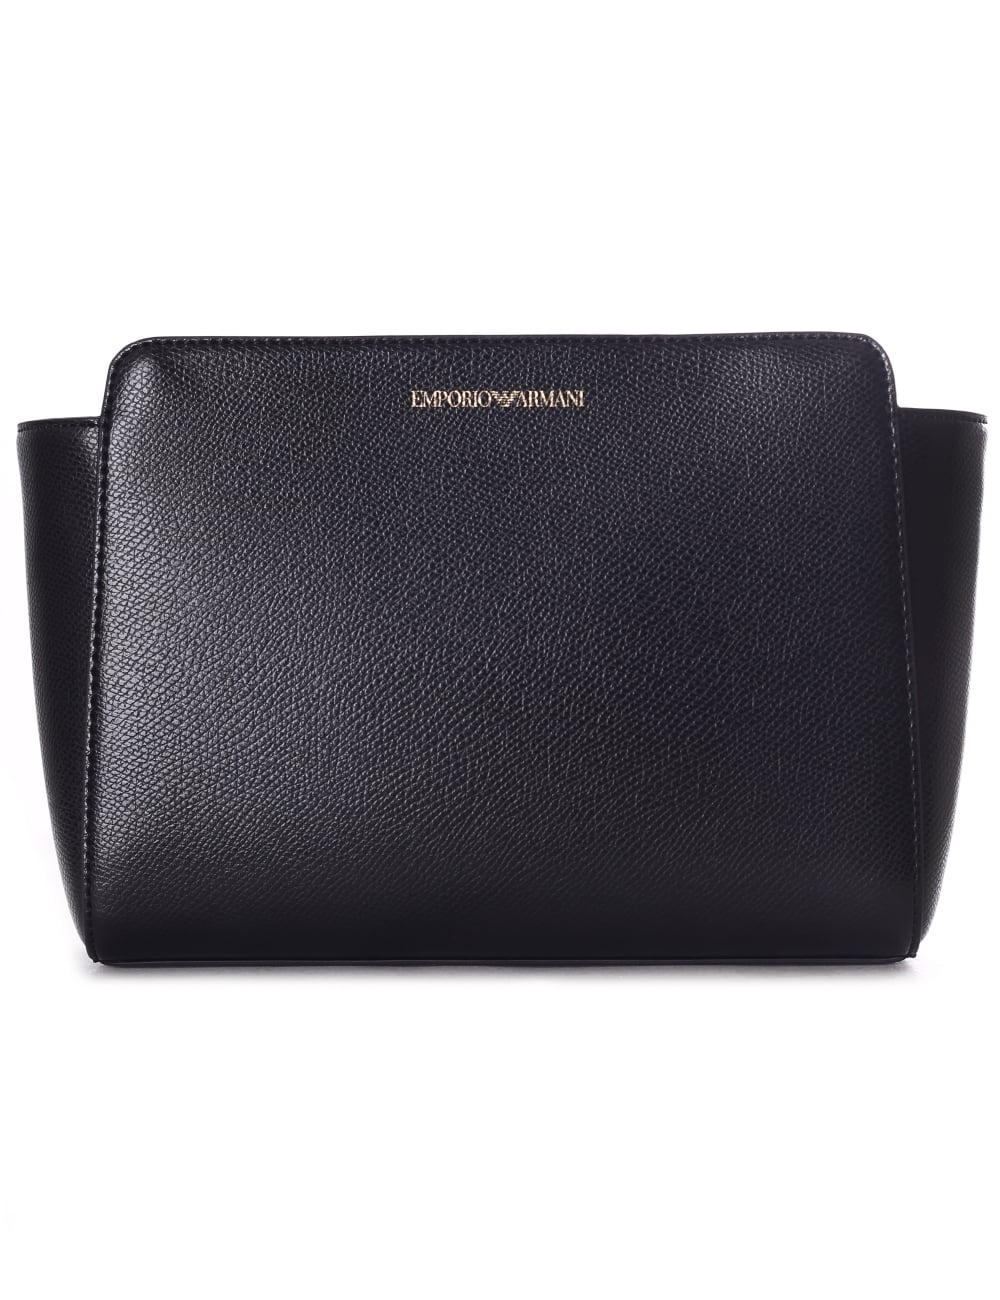 Emporio Armani Women s Medium Grain Crossbody Bag Black 49f98fb9267e8